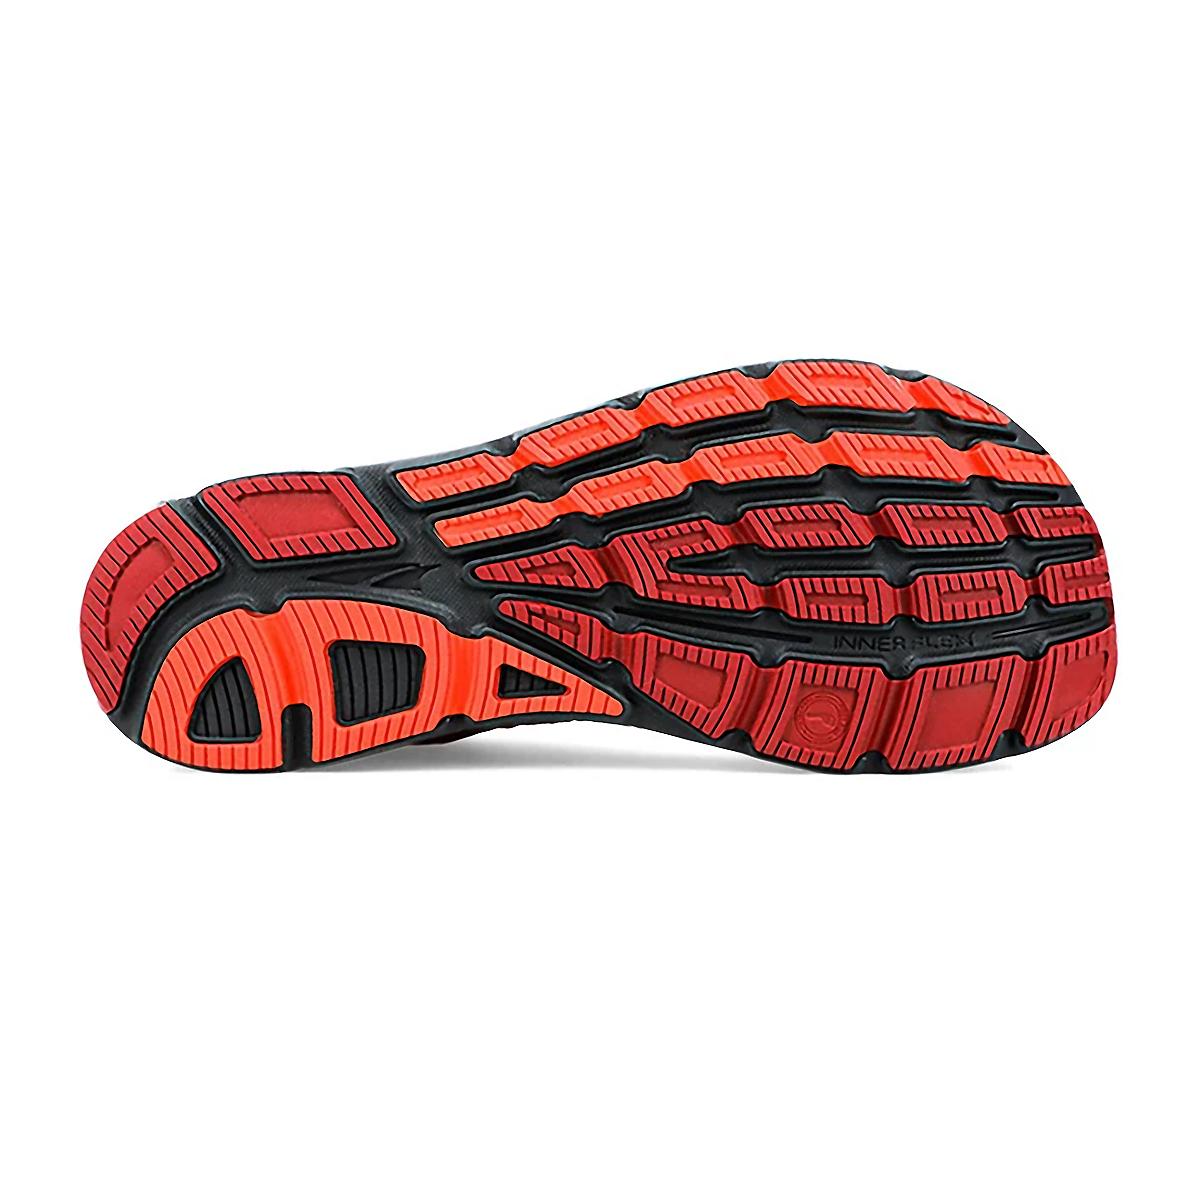 Men's Altra Torin 4.5 Plush Running Shoe - Color: Dark Red - Size: 7 - Width: Regular, Dark Red, large, image 4